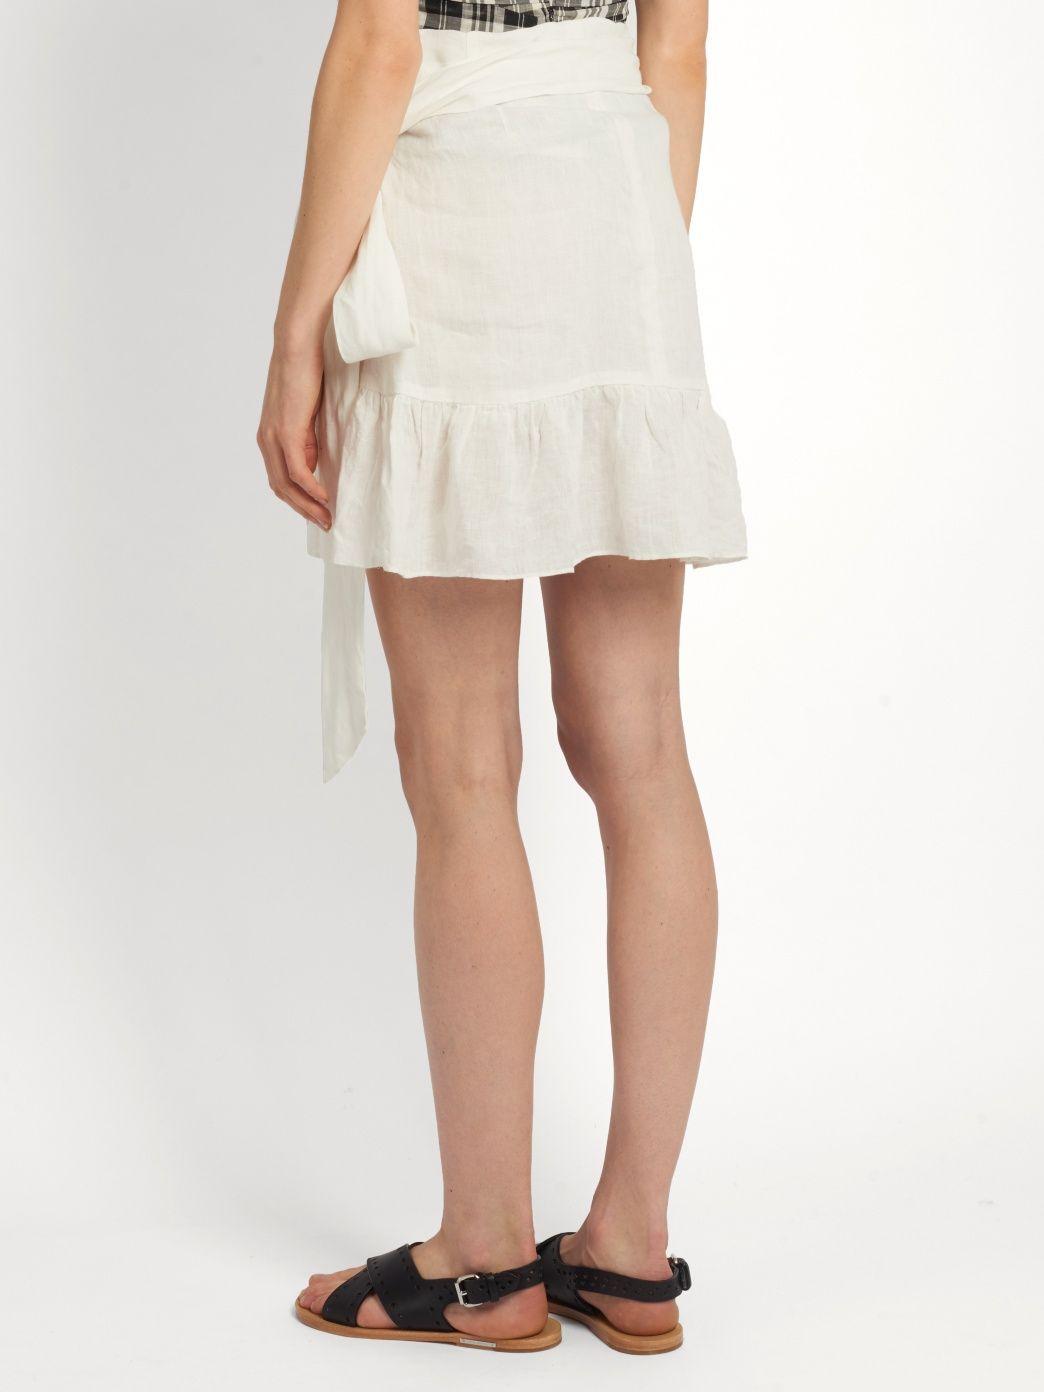 10f05e0f9 Click here to buy Isabel Marant Étoile Dempster ruffled mini skirt at  MATCHESFASHION.COM